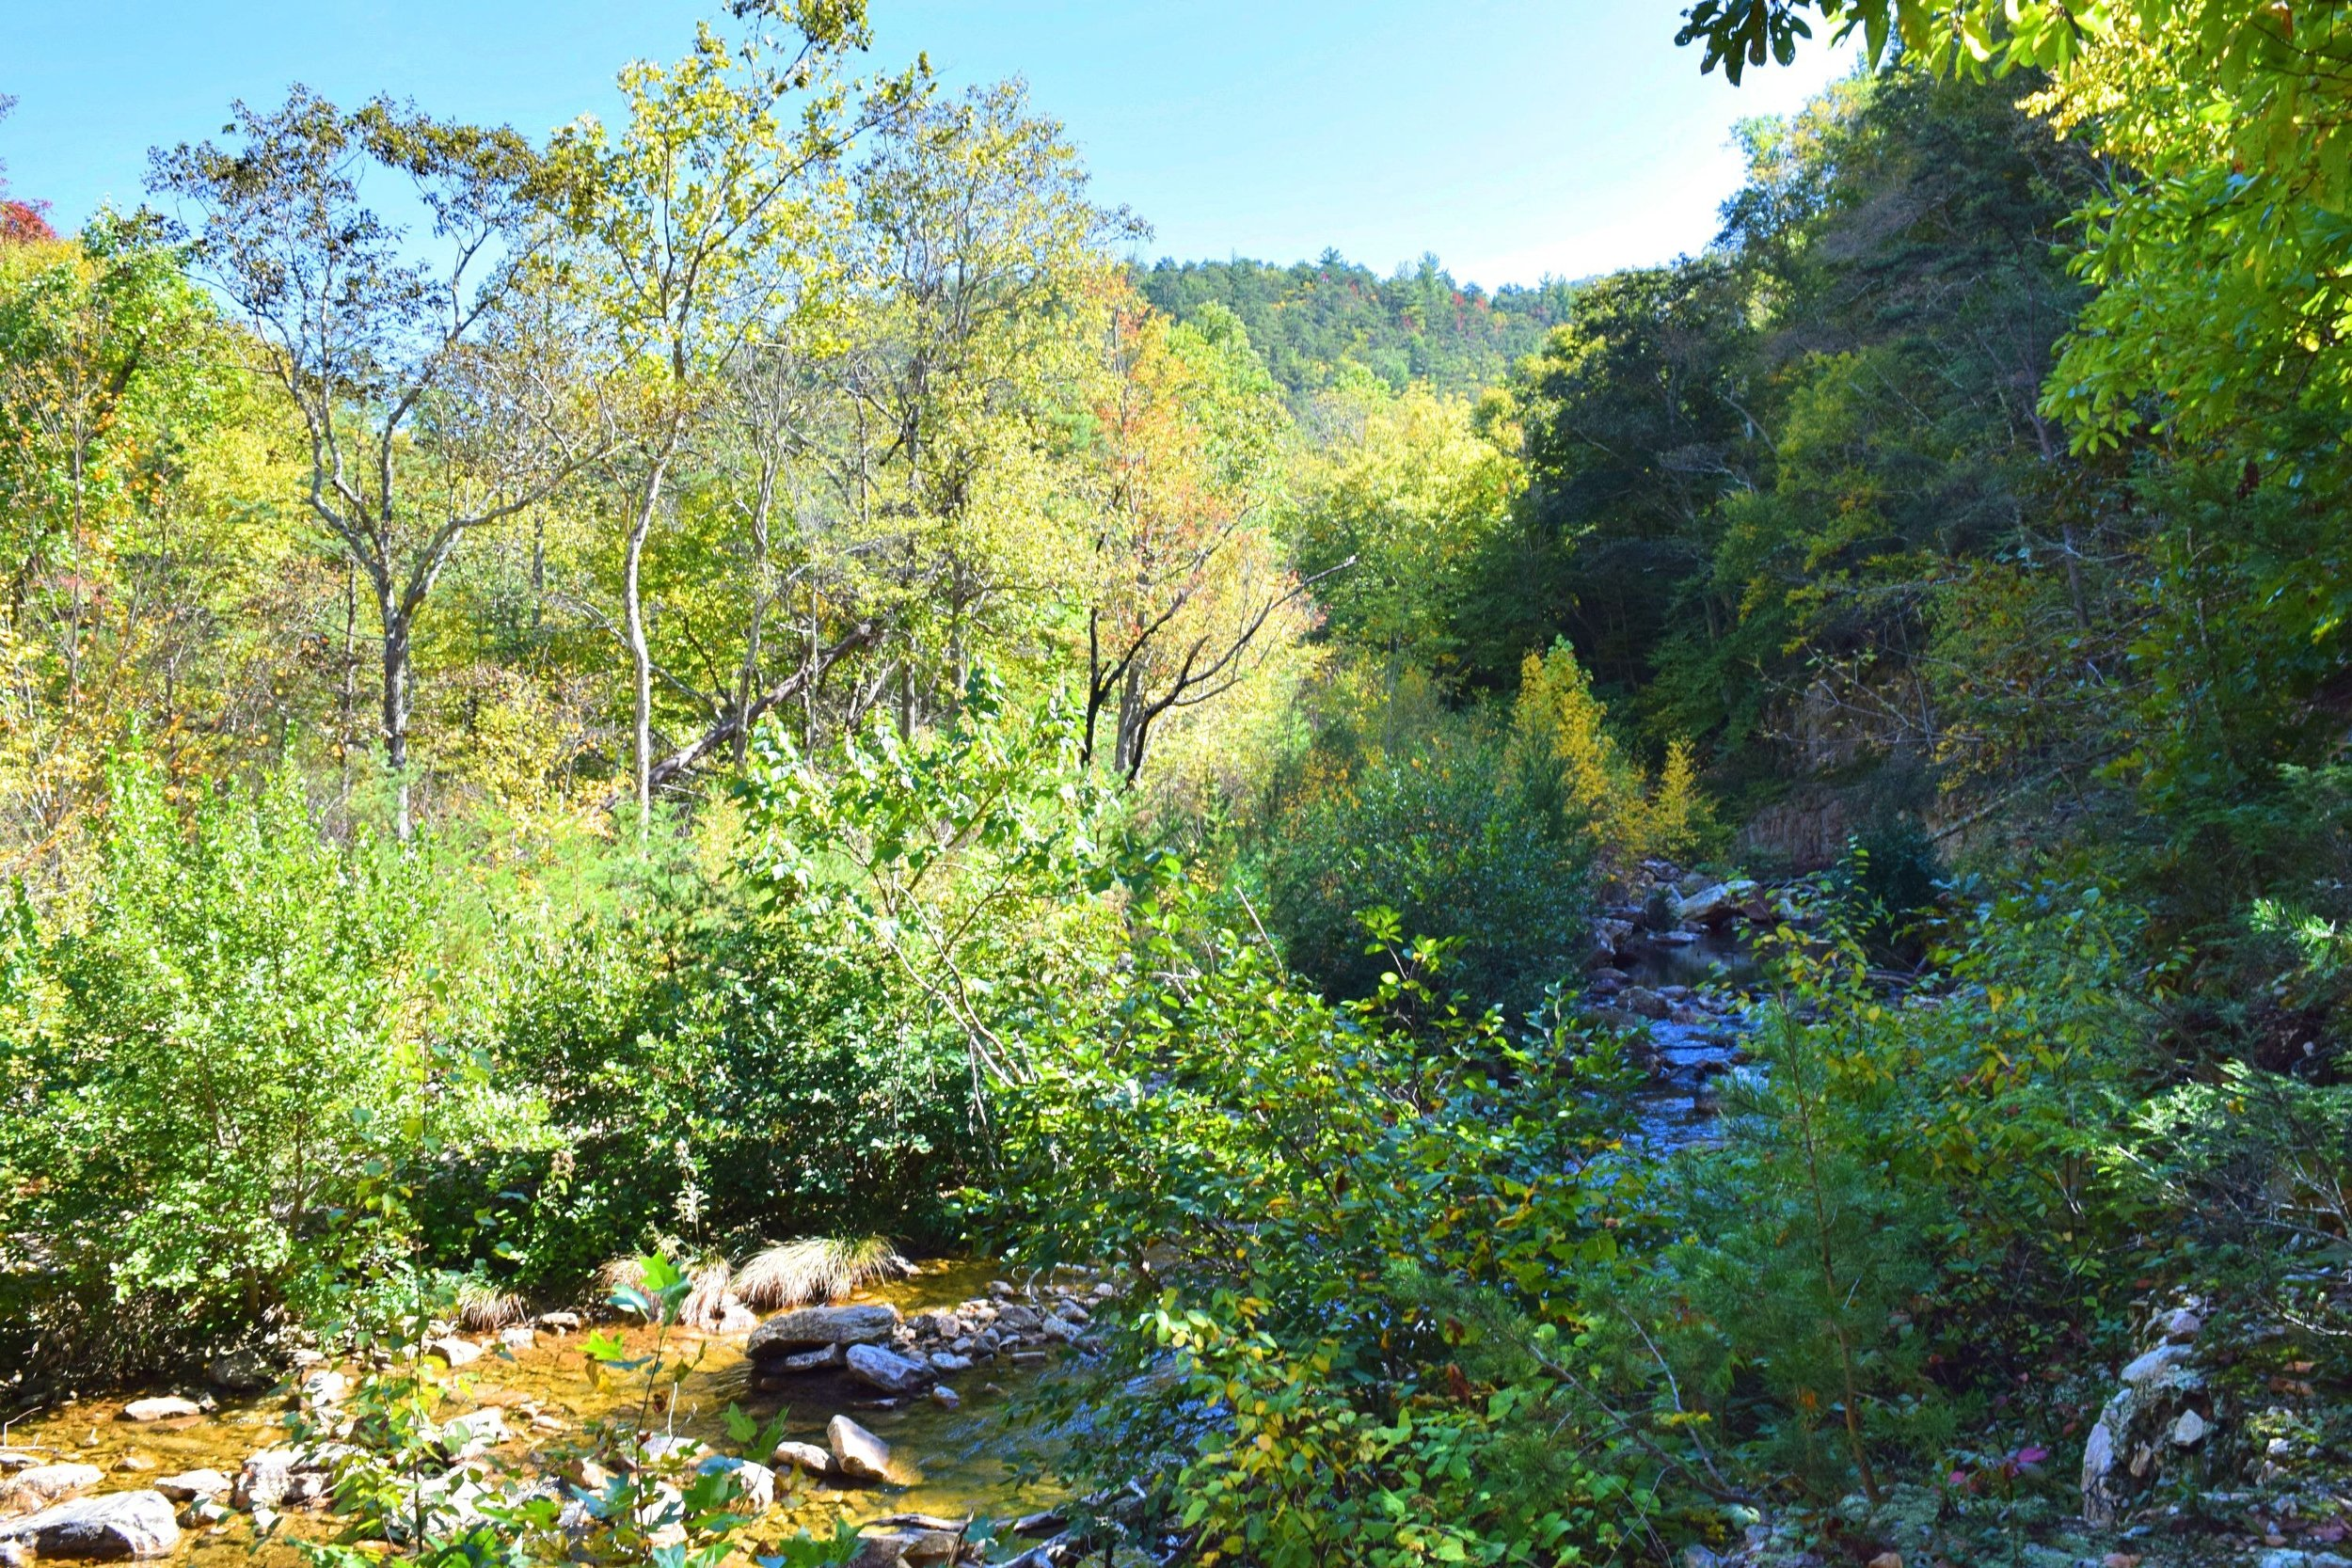 Saint Mary's Wilderness